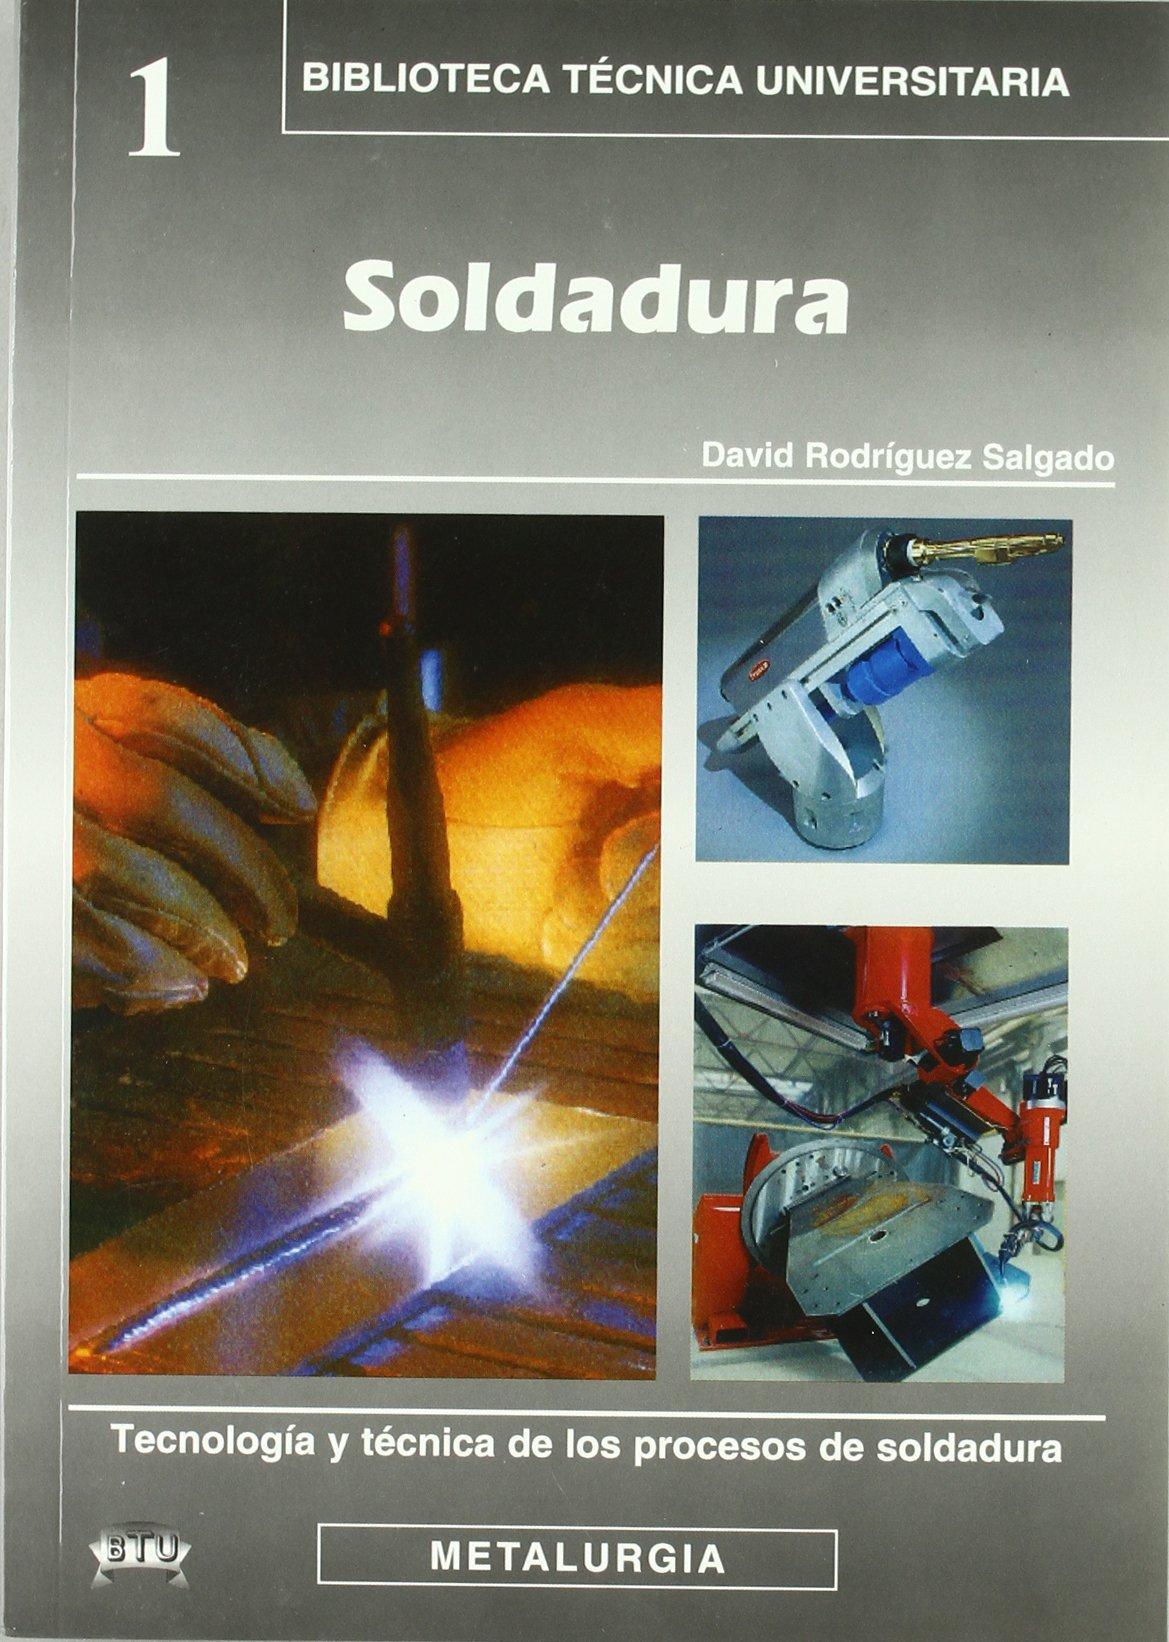 SOLDADURA: DAVID RODRIGUEZ SALGADO: 9788495279620: Amazon.com: Books